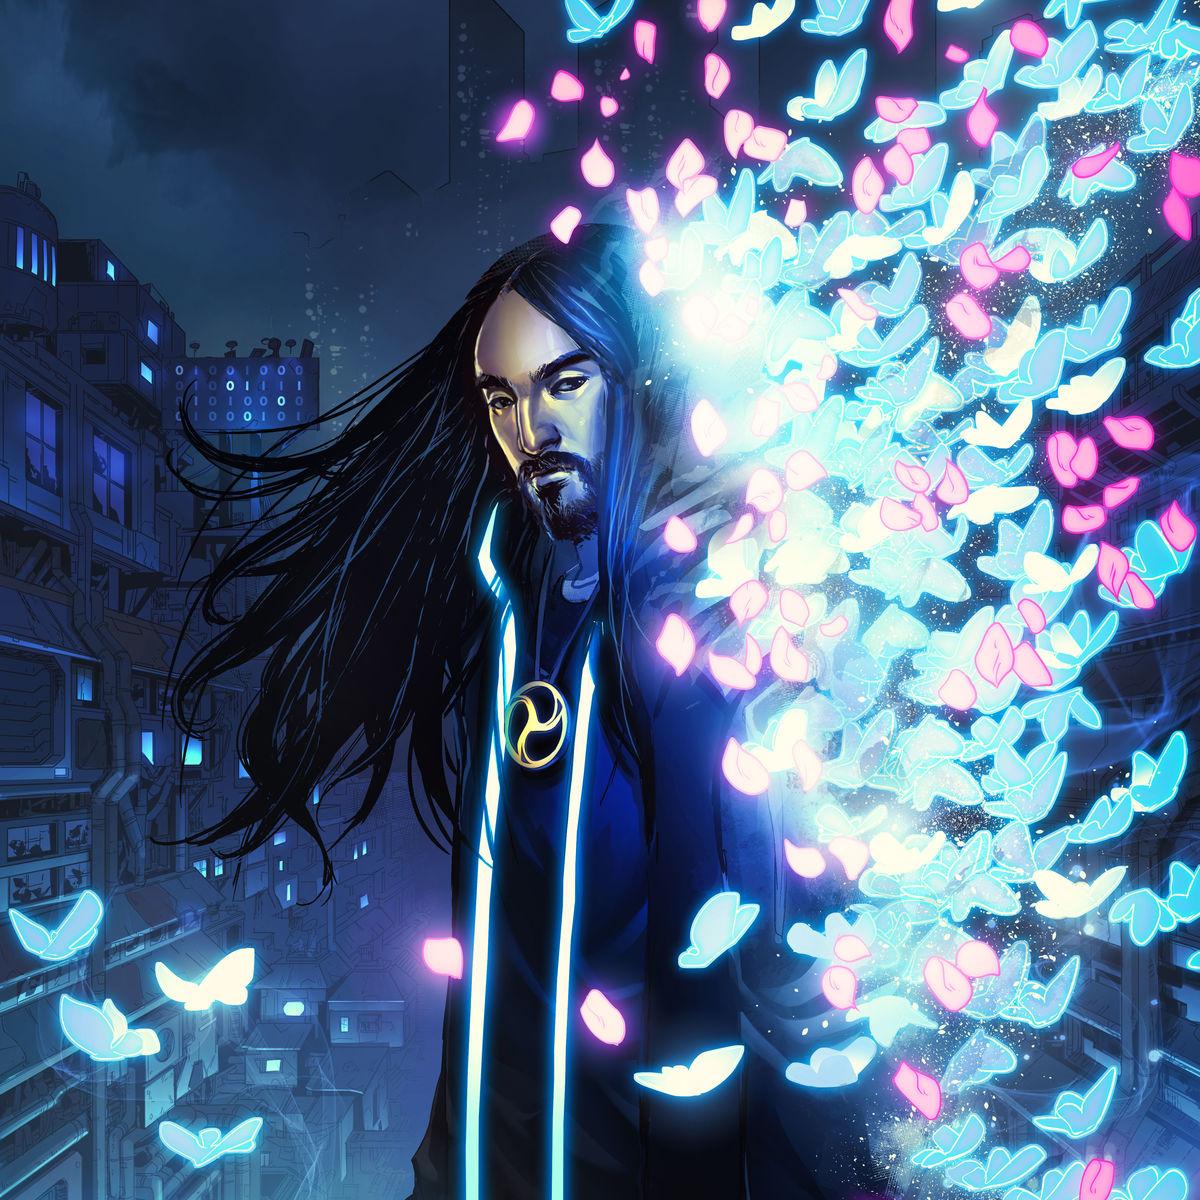 Neon Future Cover Steve aoki